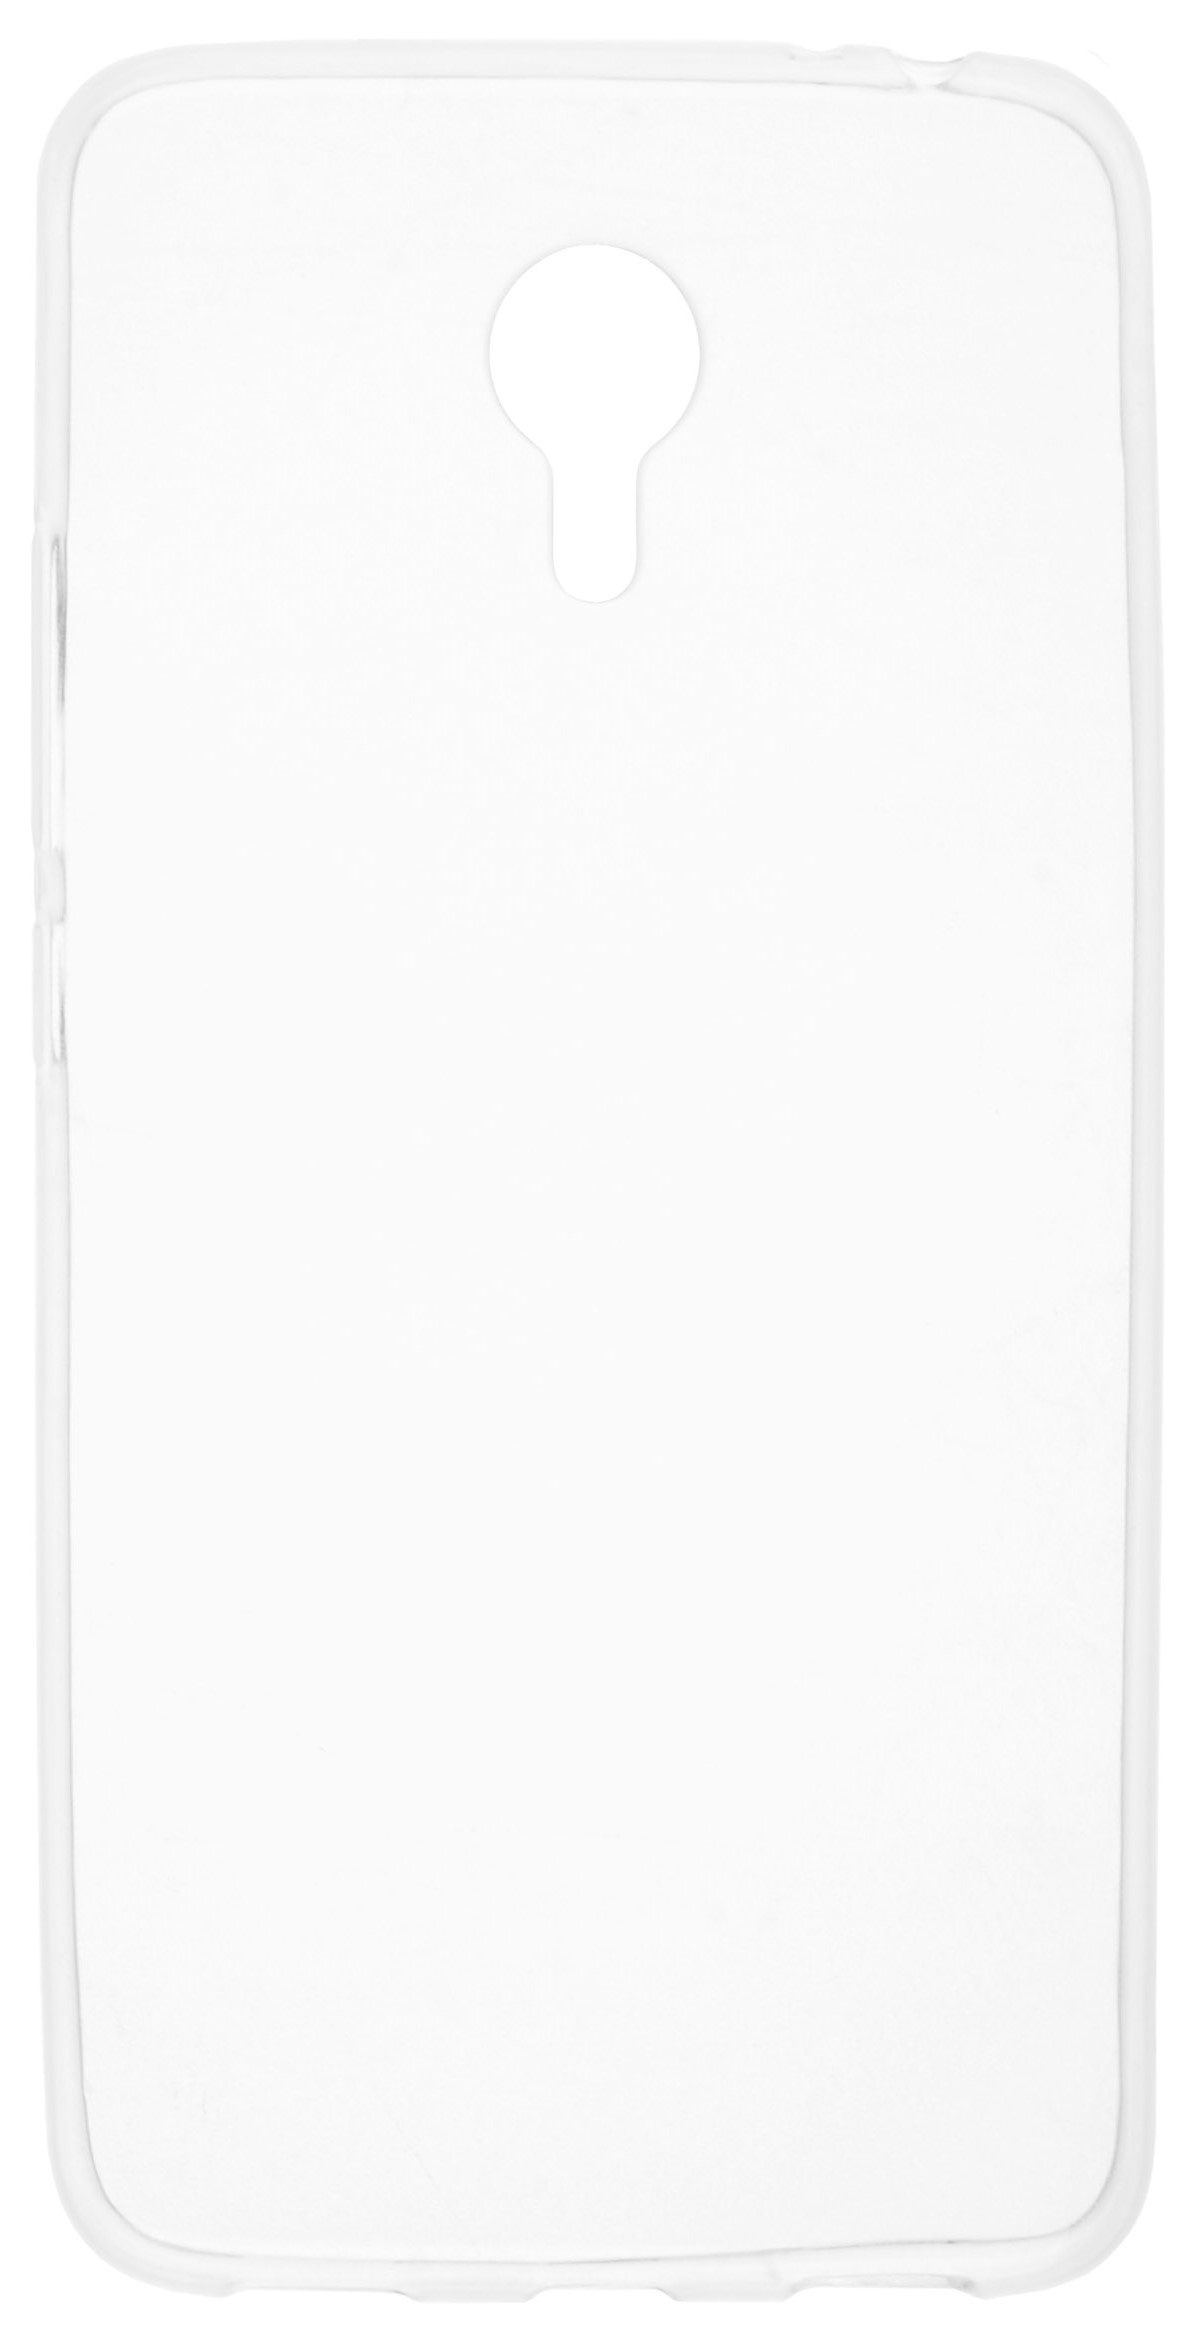 Чехол для сотового телефона skinBOX Slim Silicone, 4630042528093, прозрачный чехол для сотового телефона skinbox slim silicone 4660041408157 прозрачный